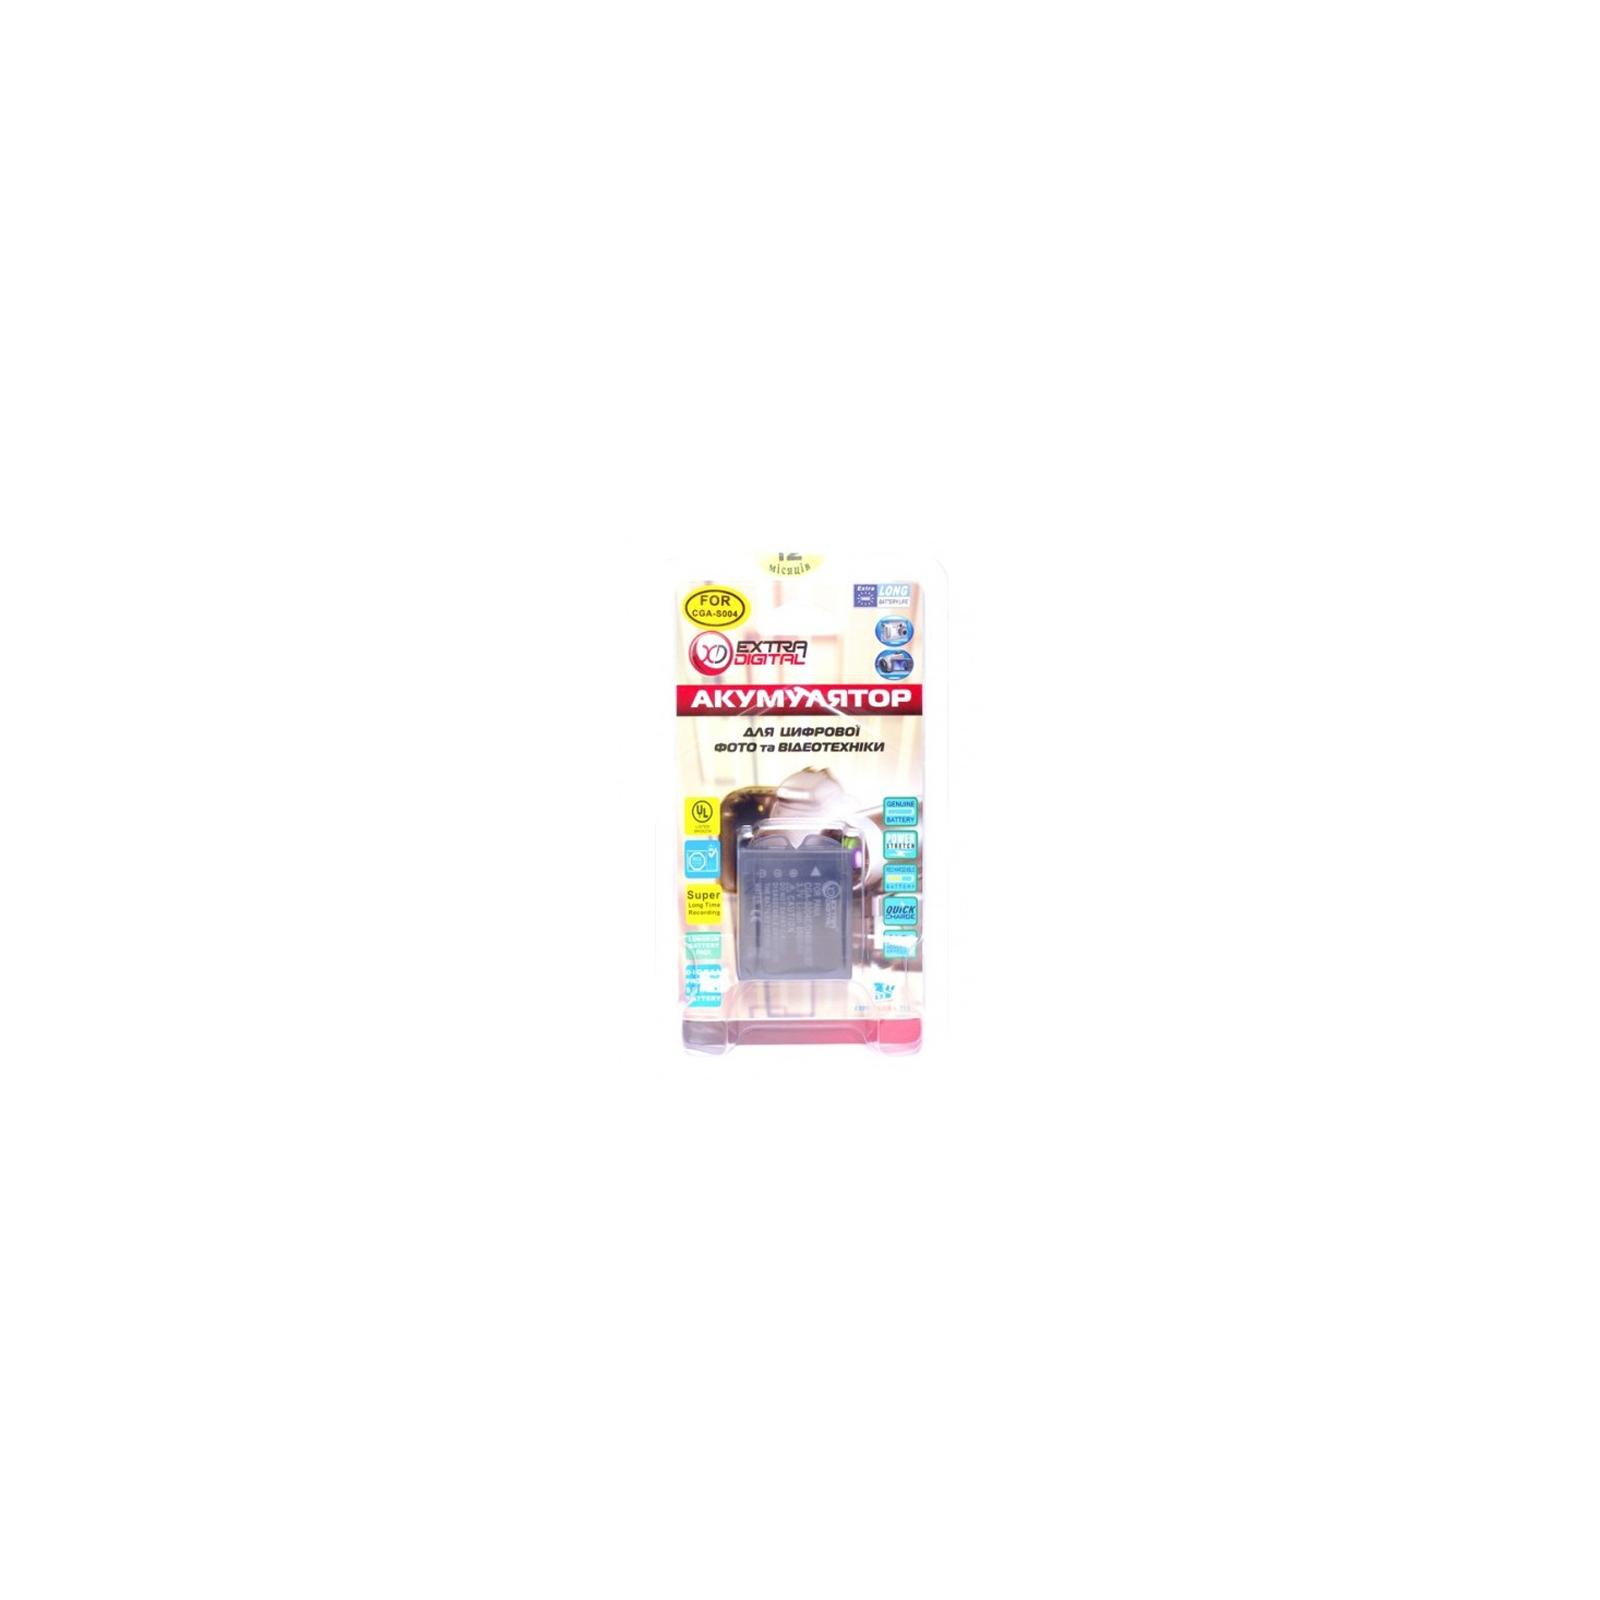 Аккумулятор к фото/видео EXTRADIGITAL Panasonic S004 (DV00DV1098) изображение 3